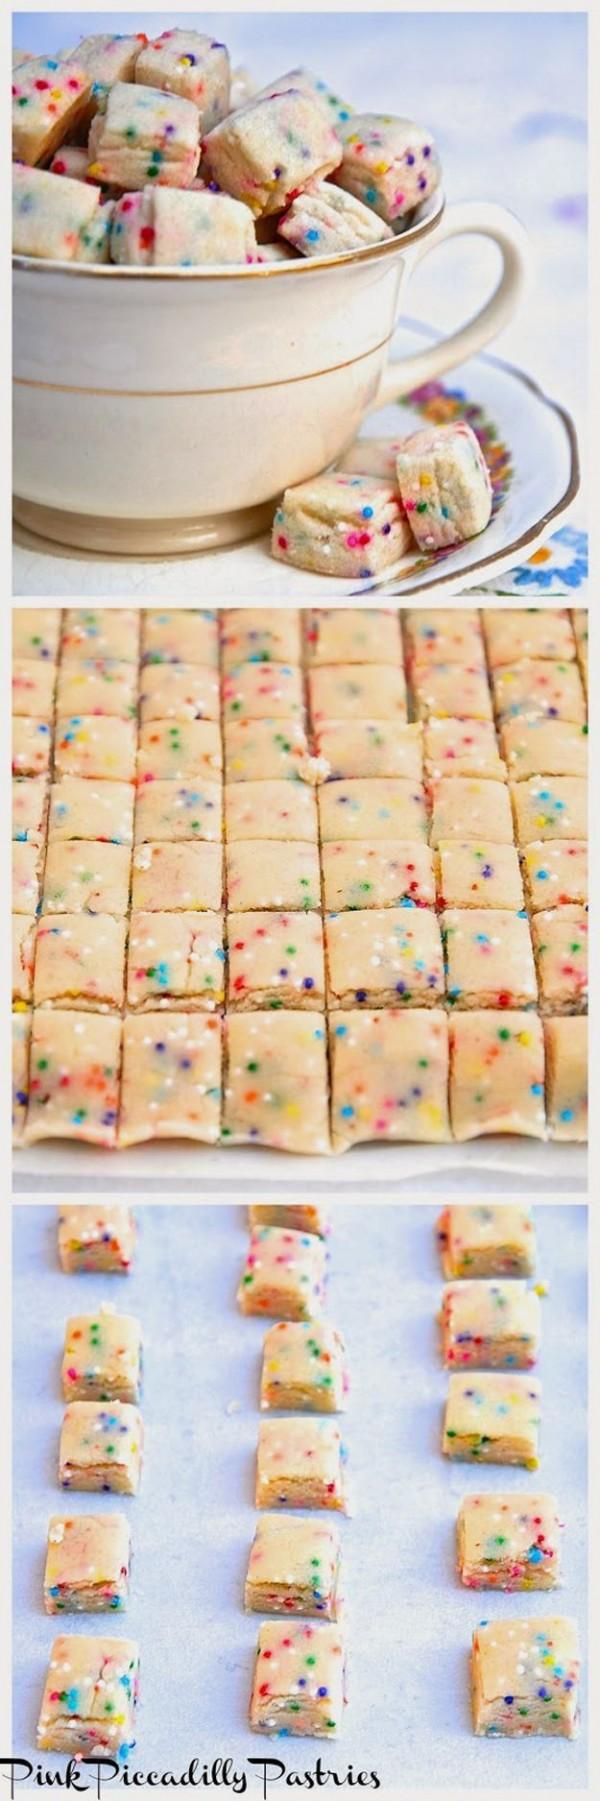 confeti snacks